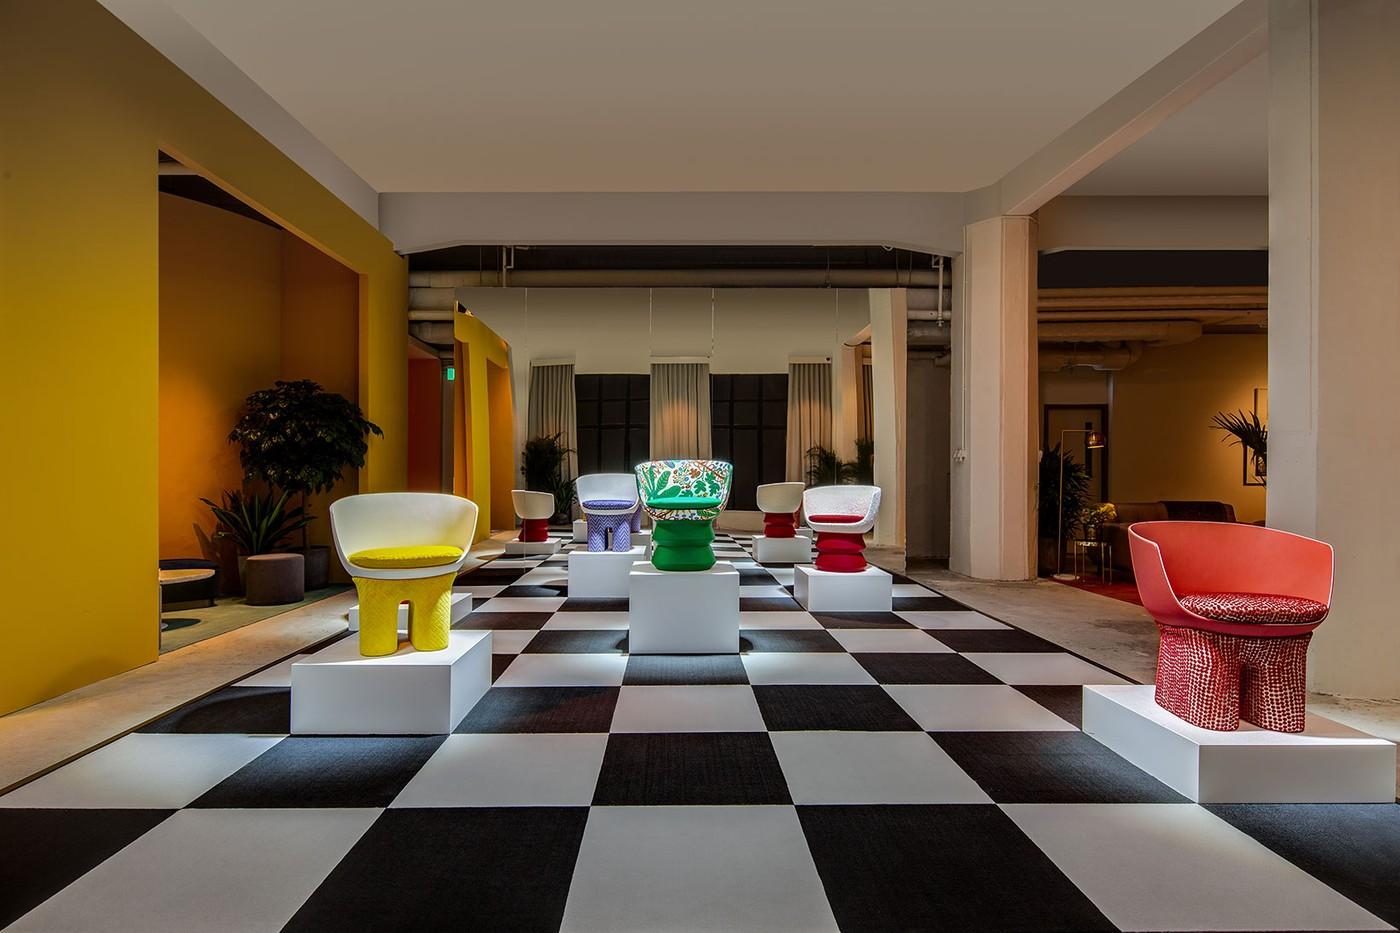 Louis Vuitton furniture collection